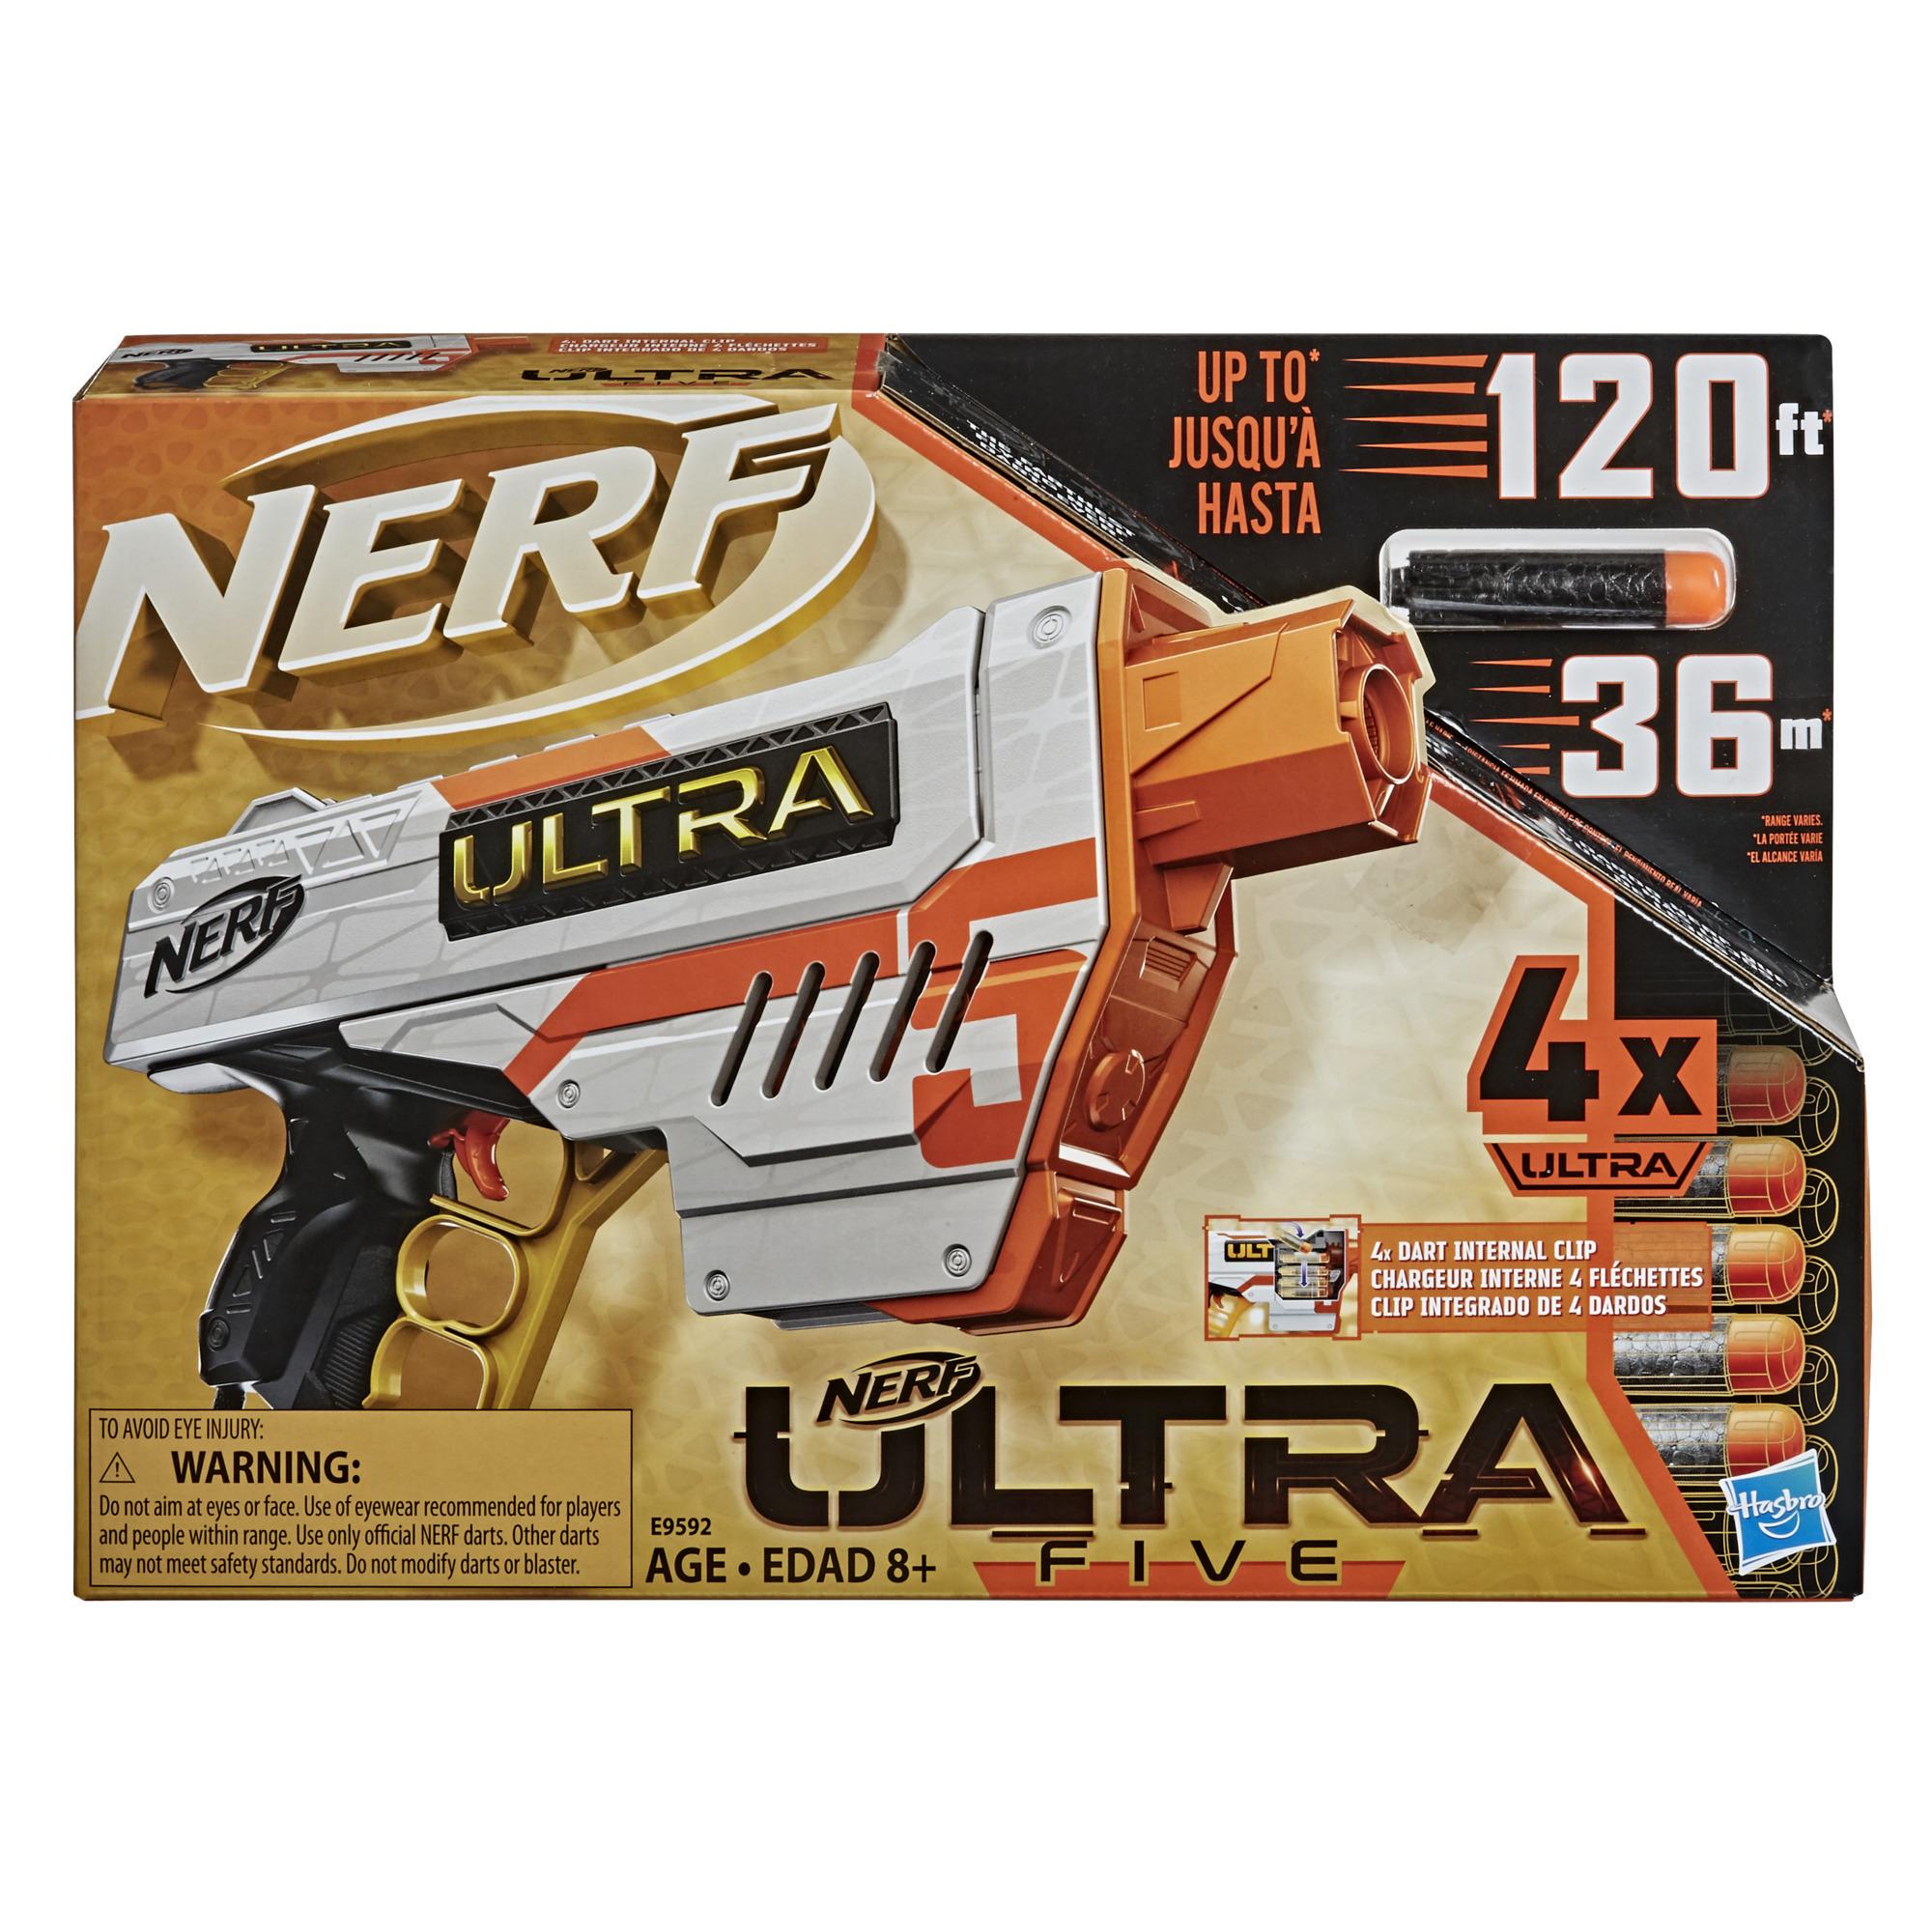 Nerf Ultra Five Blaster -- 4-Dart Internal Clip, 4 Nerf Ultra Darts, Dart Storage, Compatible Only with Nerf Ultra Darts